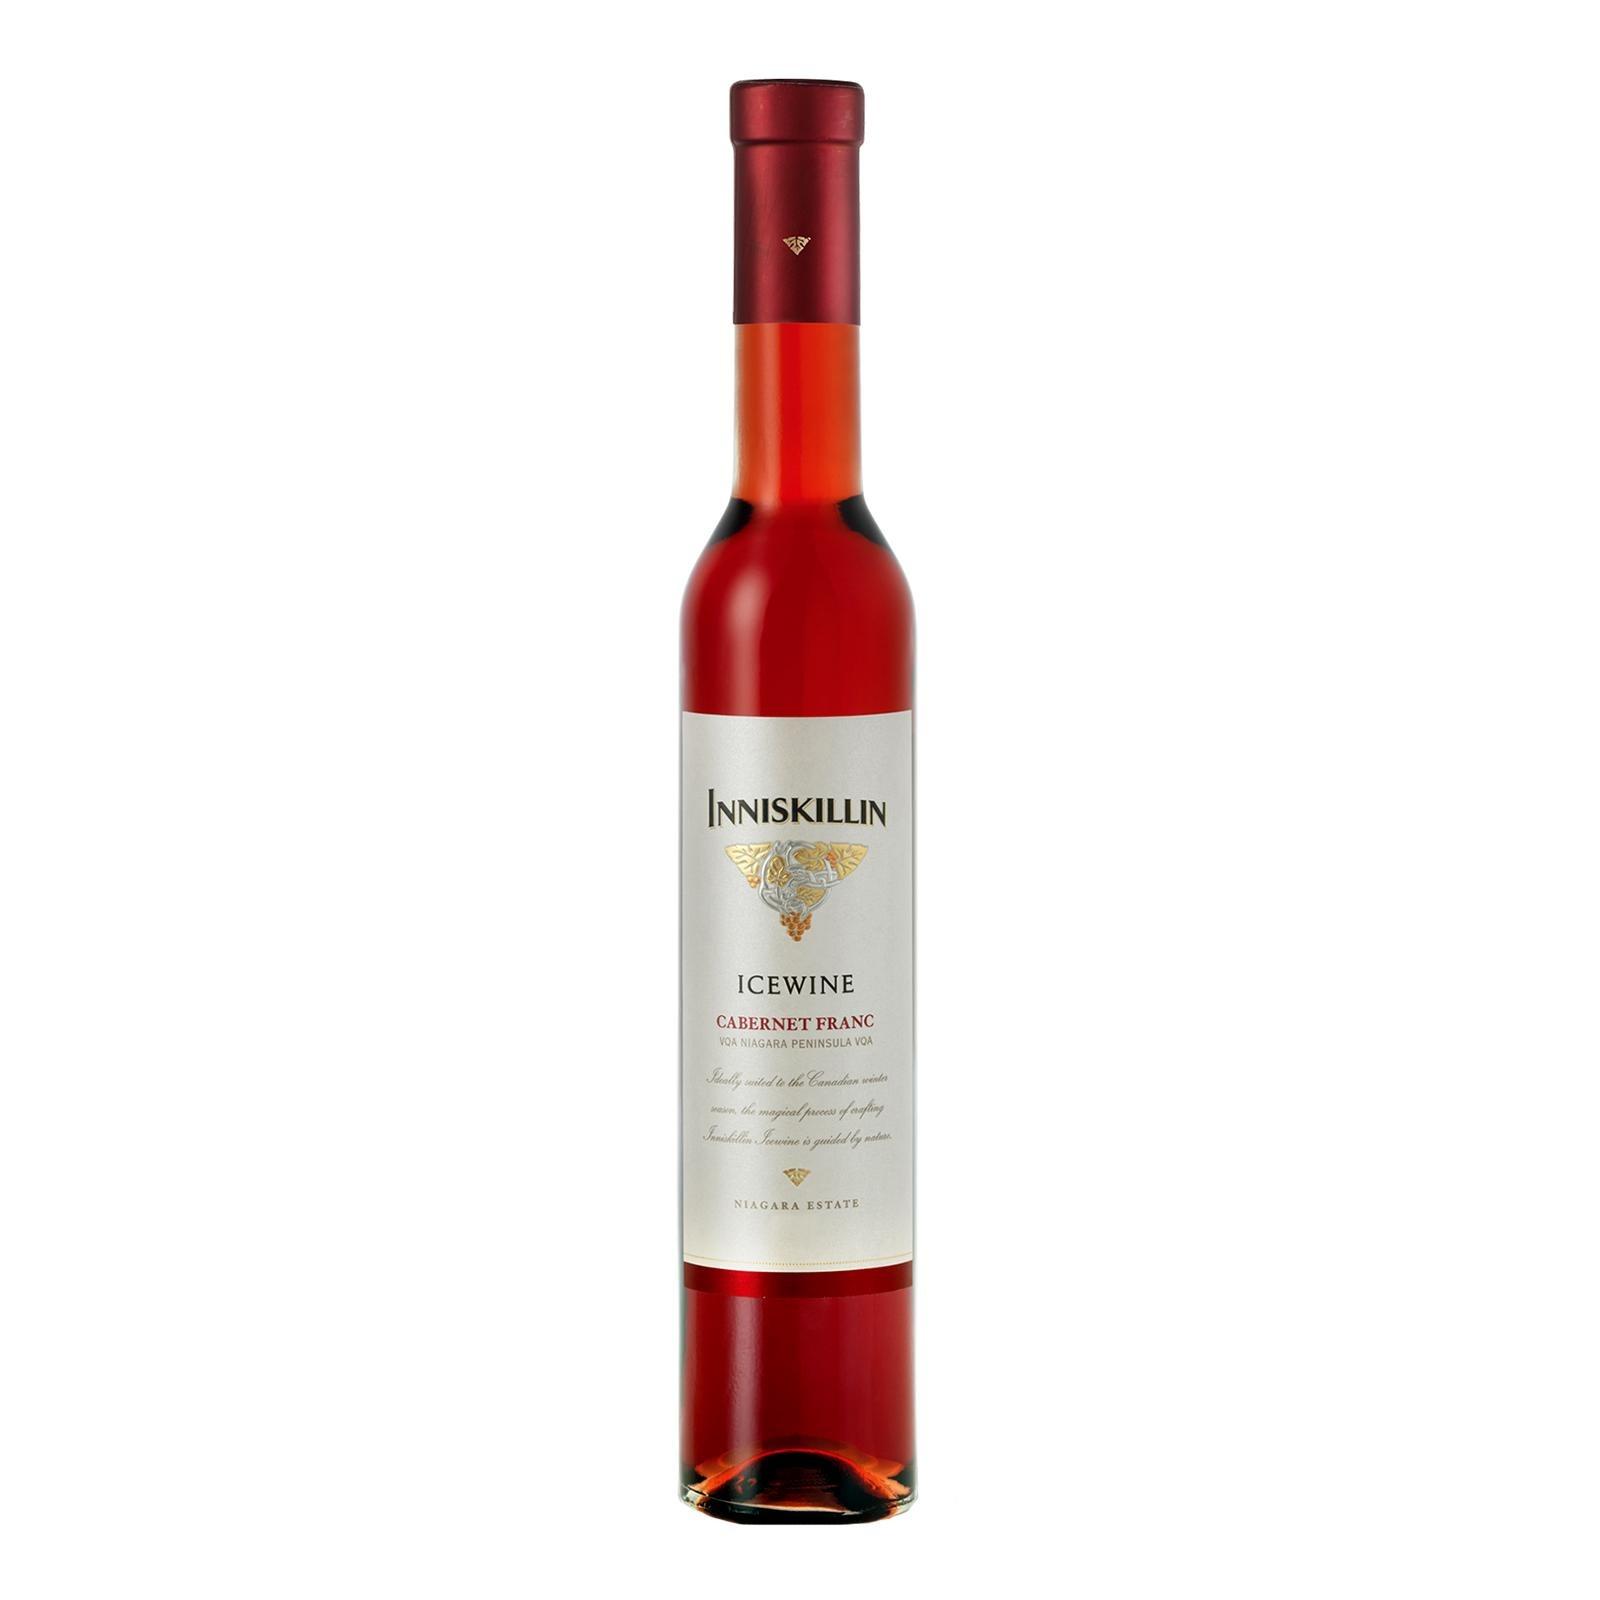 Inniskillin Cabernet Franc Ice Wine Vqa